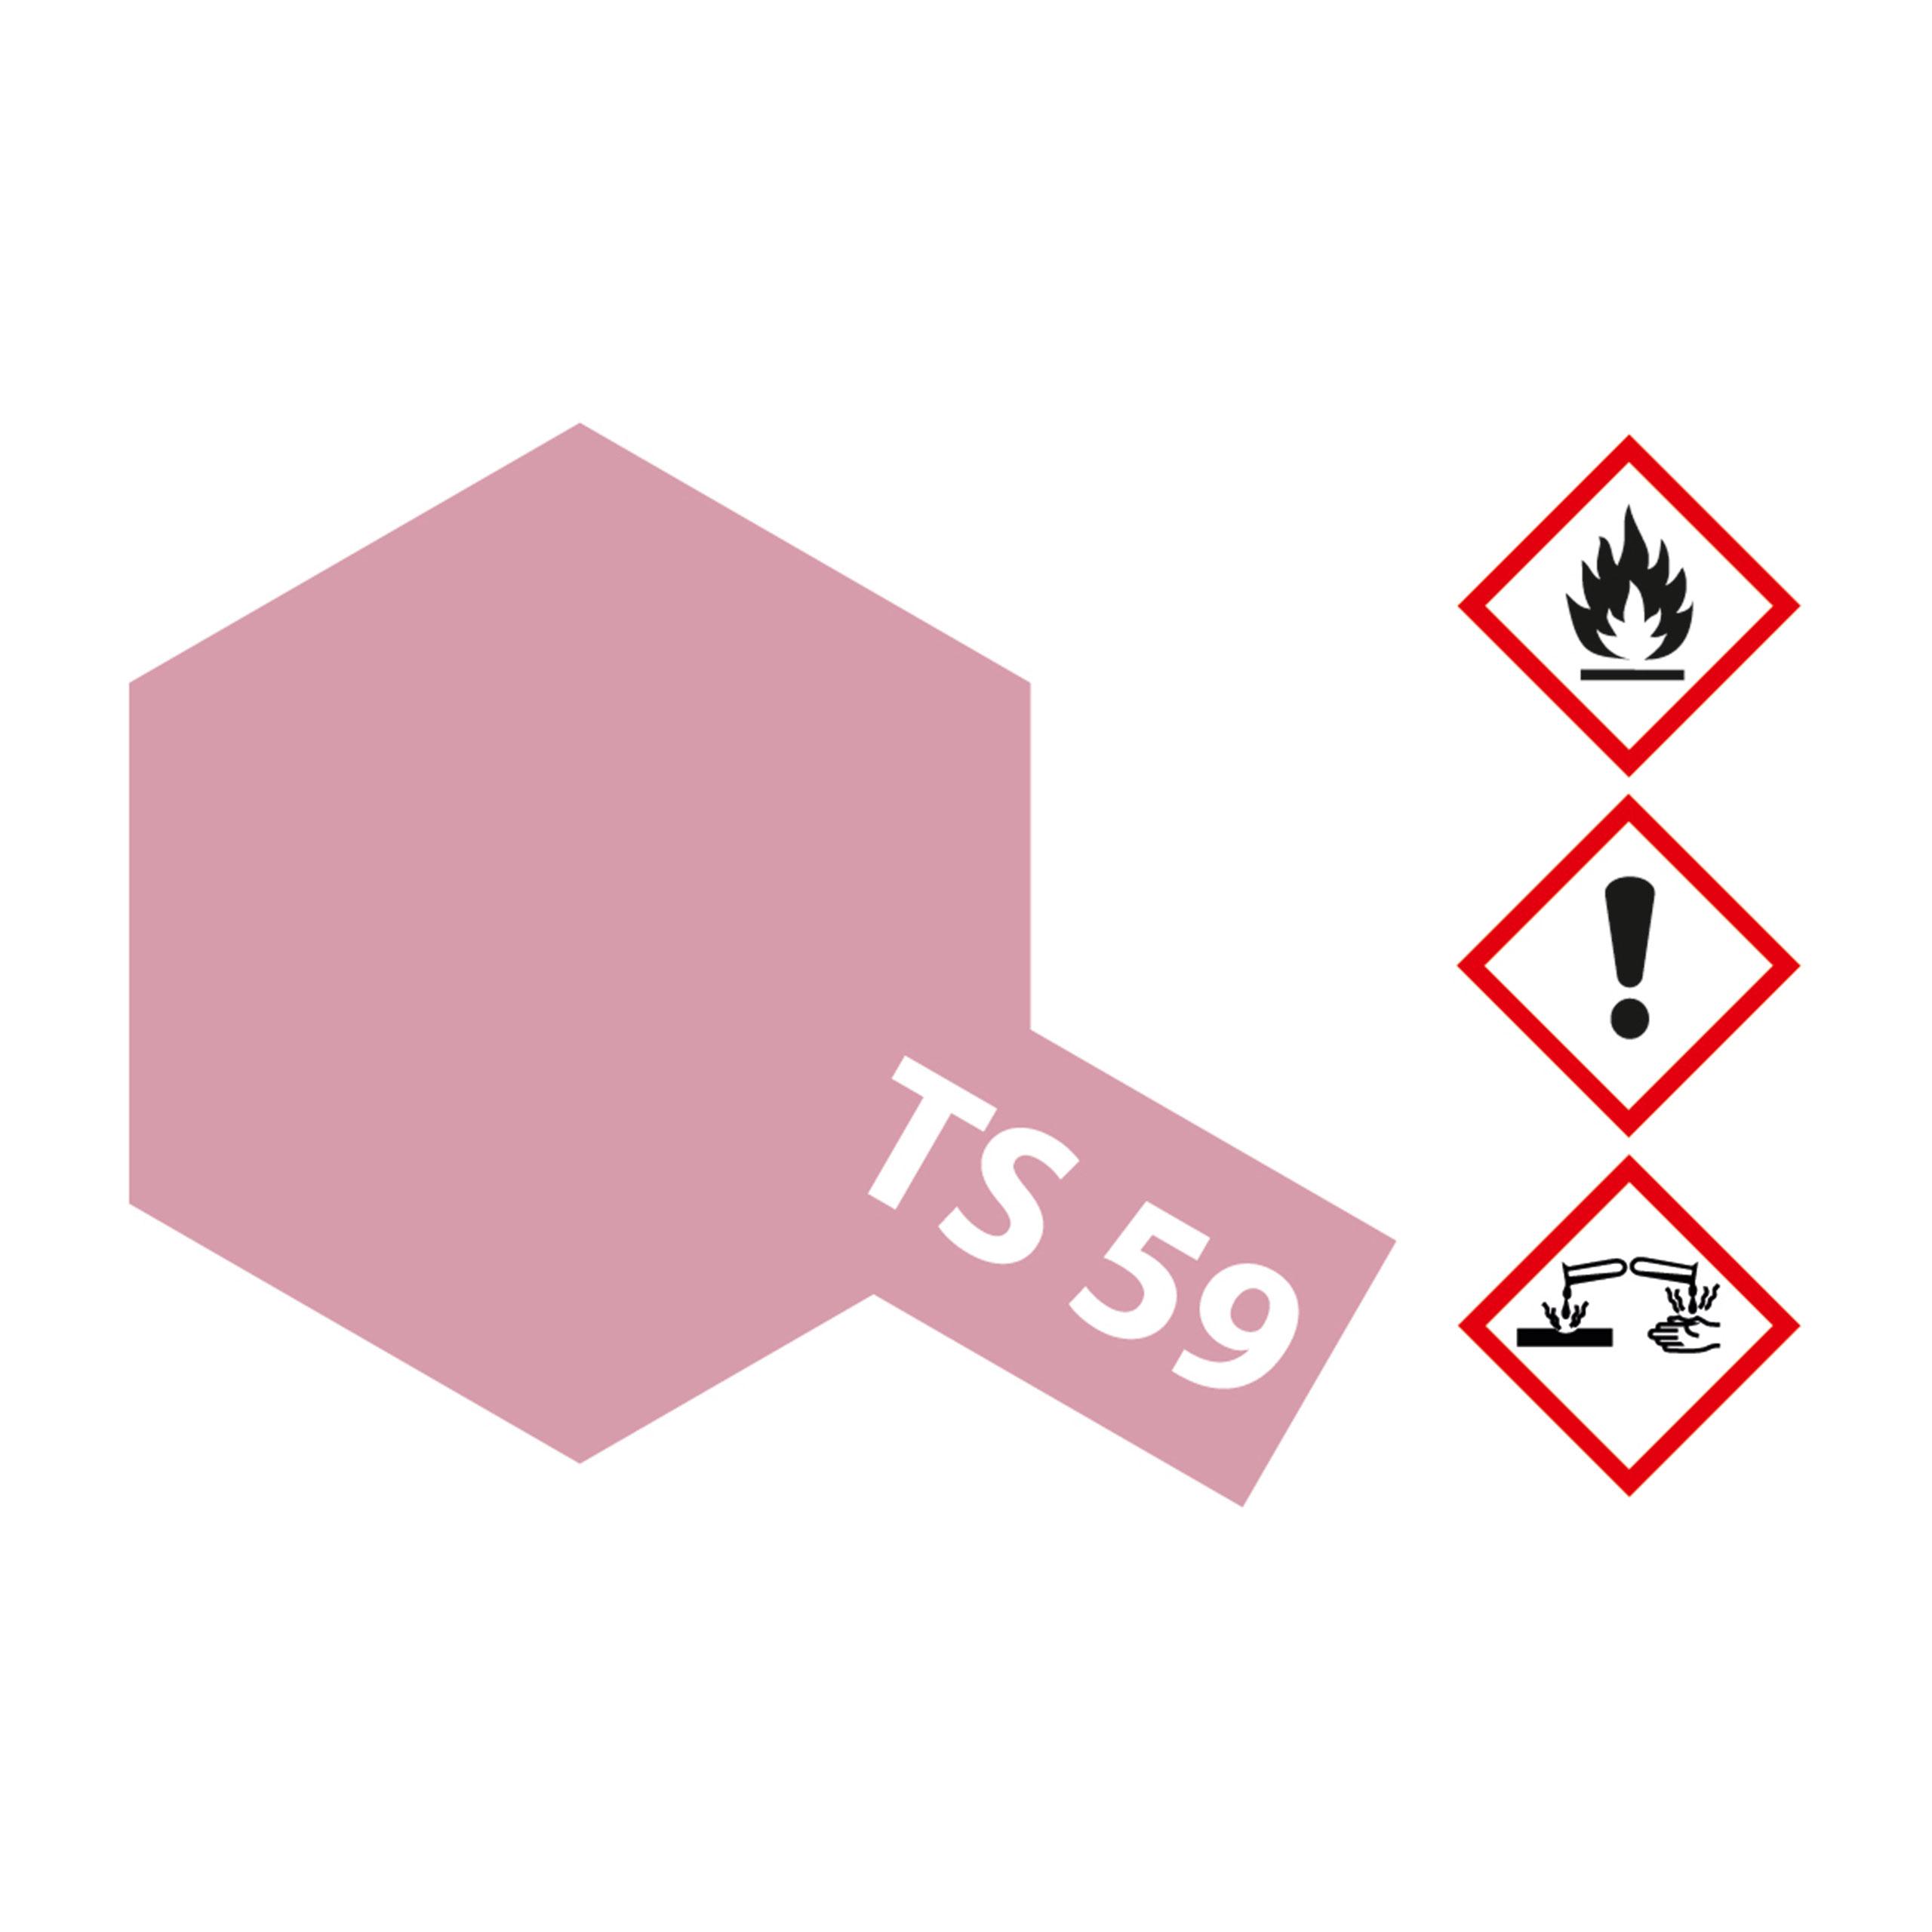 TS-59 Hellrot Perleffekt glaenzend - 100ml Sprayfarbe Kunstharz Tamiya 300085059